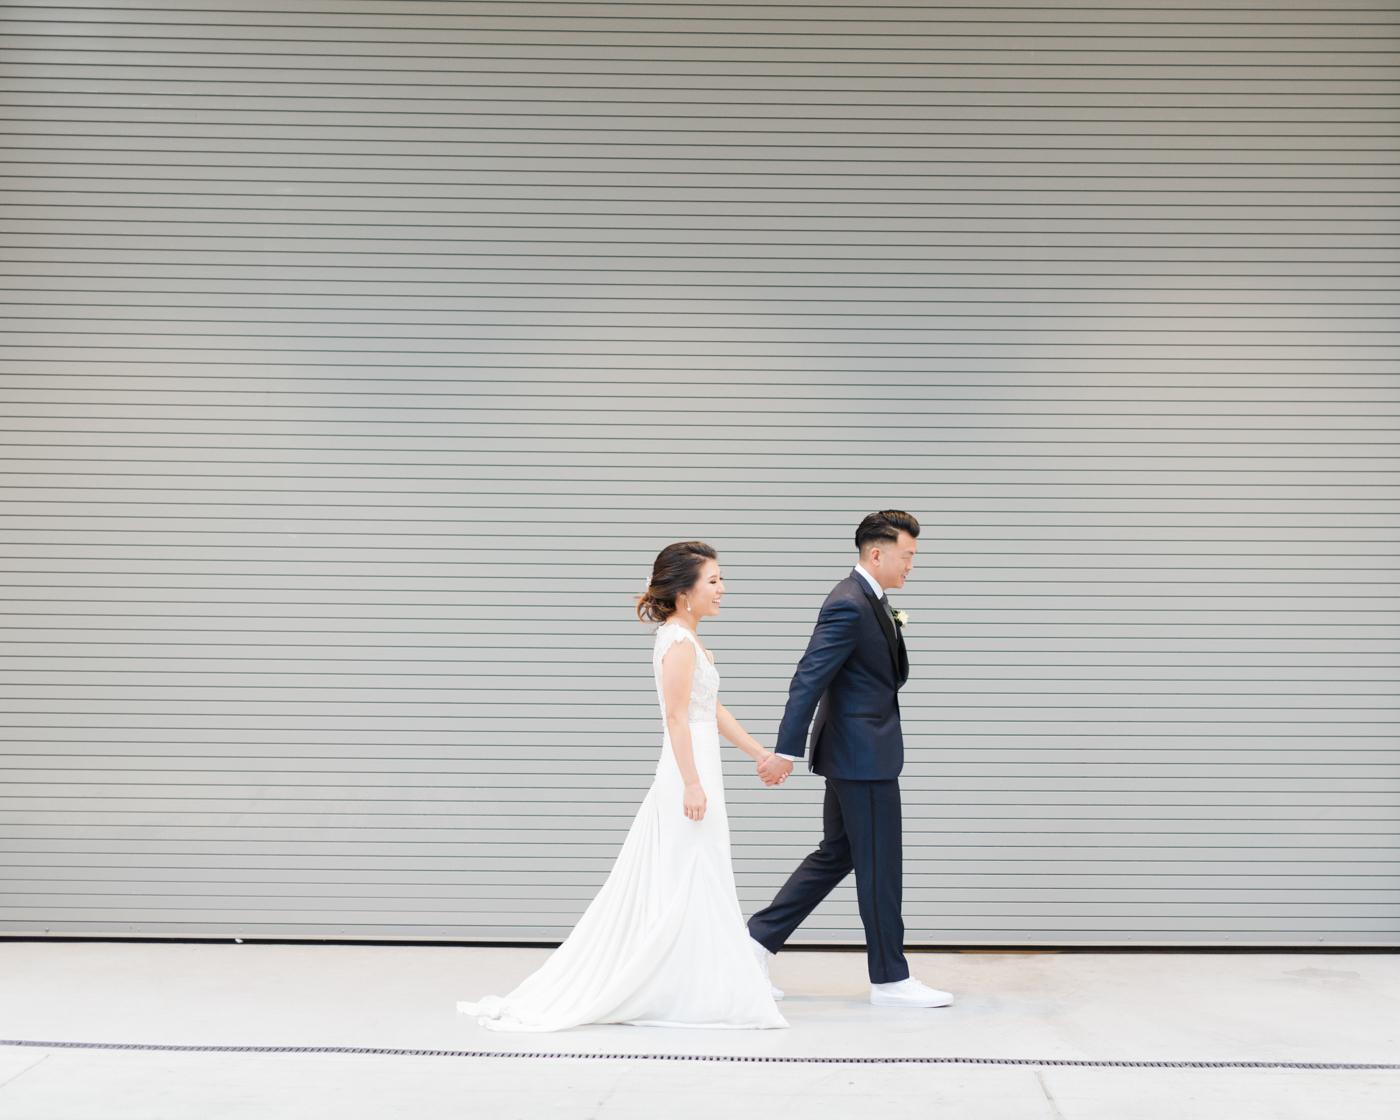 Modern_Wedding_HNYPT_Honeypot_LA_Photographer_Los_Angeles-38.jpg